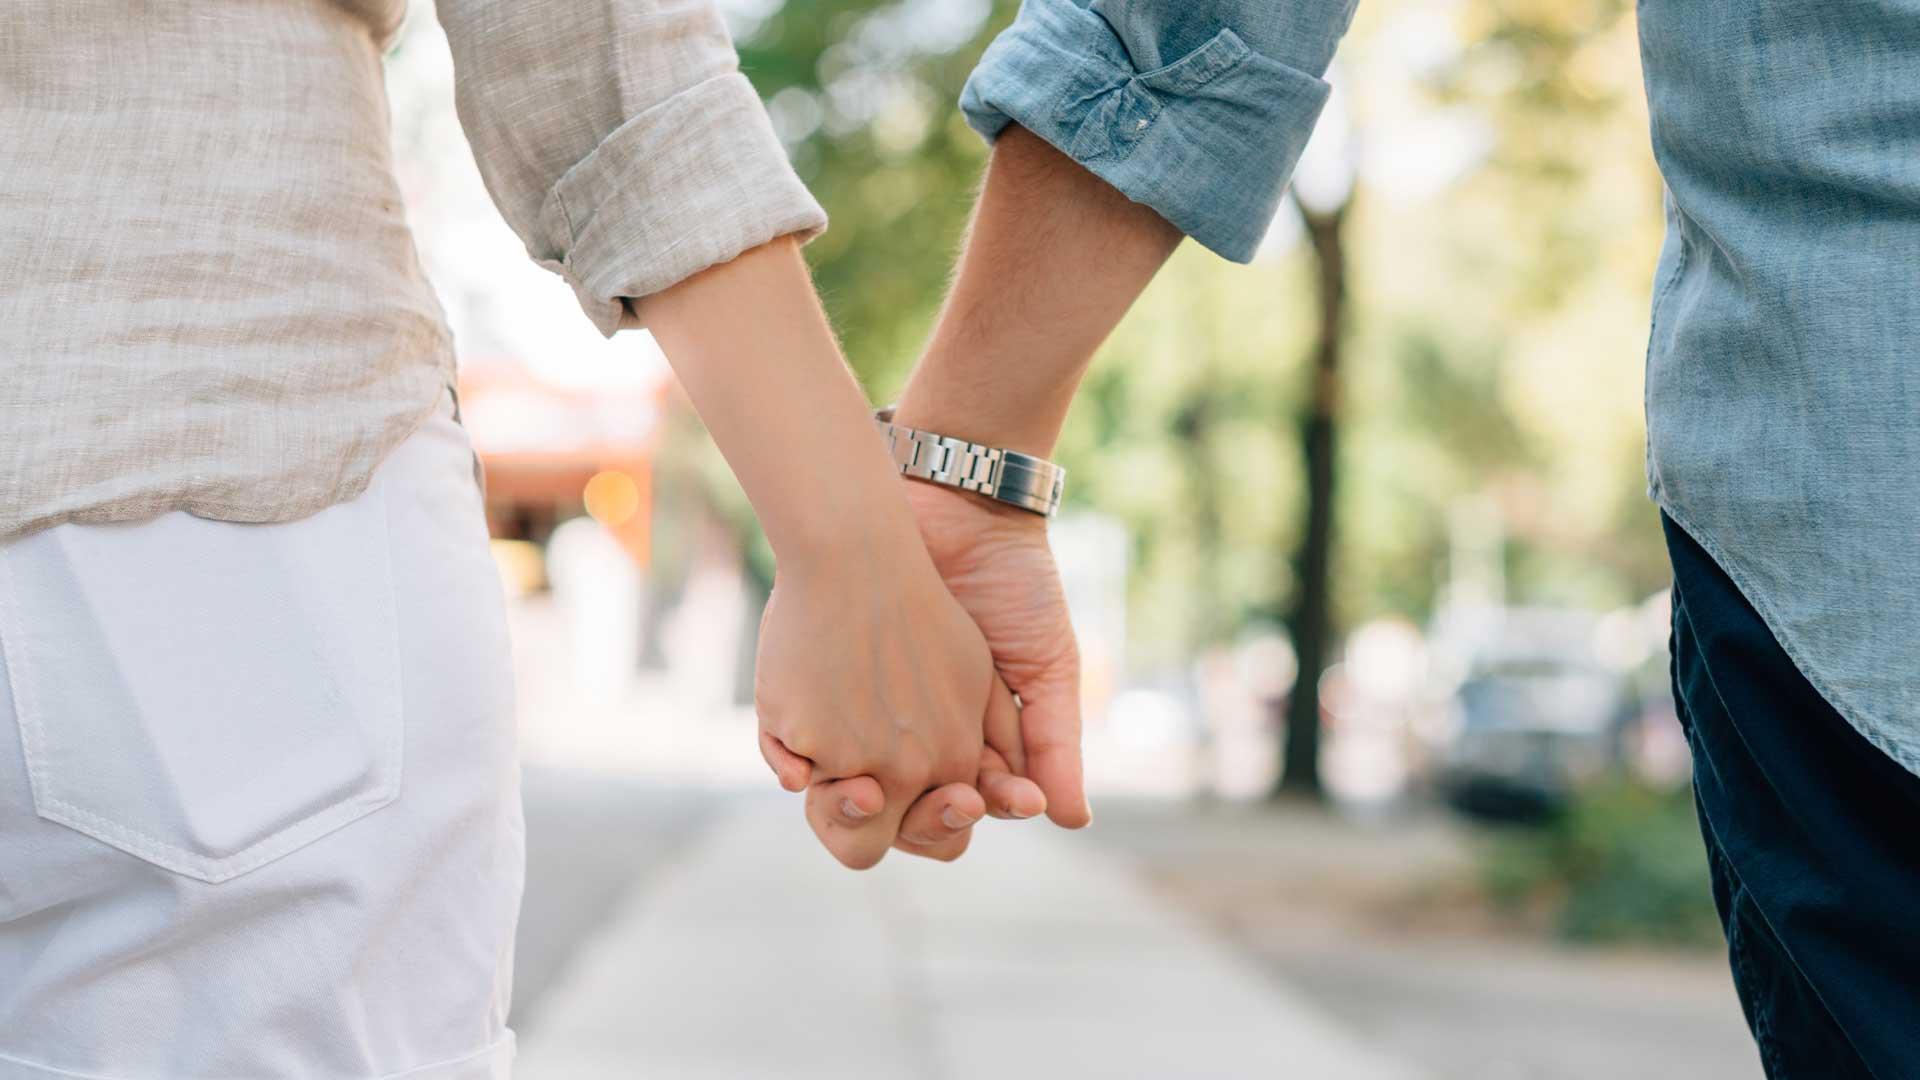 Surviving Quarantine with your Partner